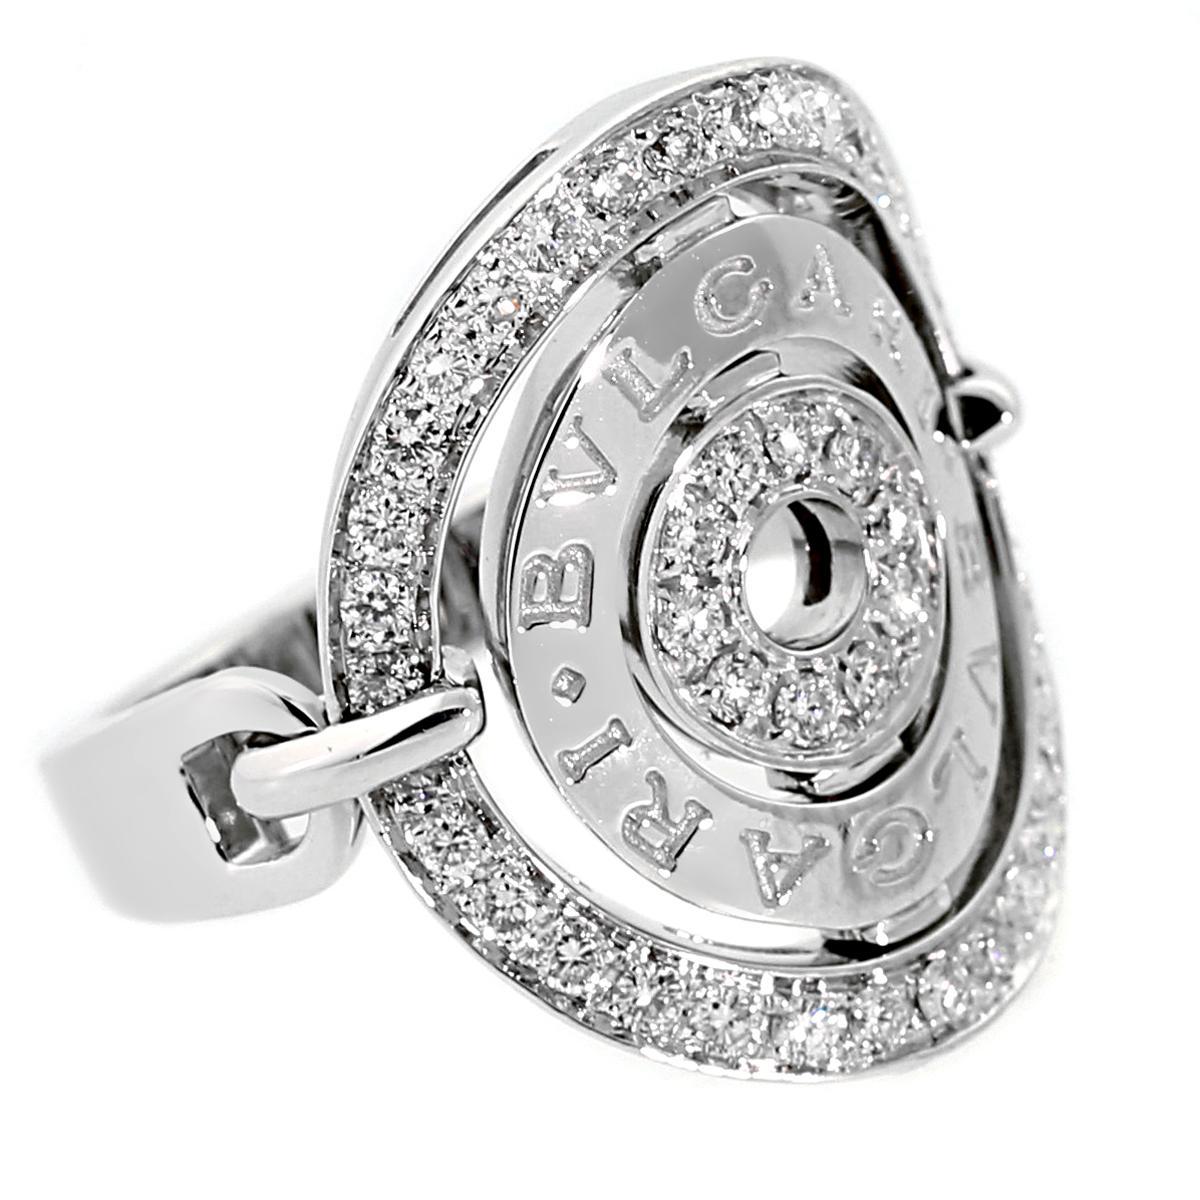 Bvlgari Astrale Diamond White Gold Cocktail Ring